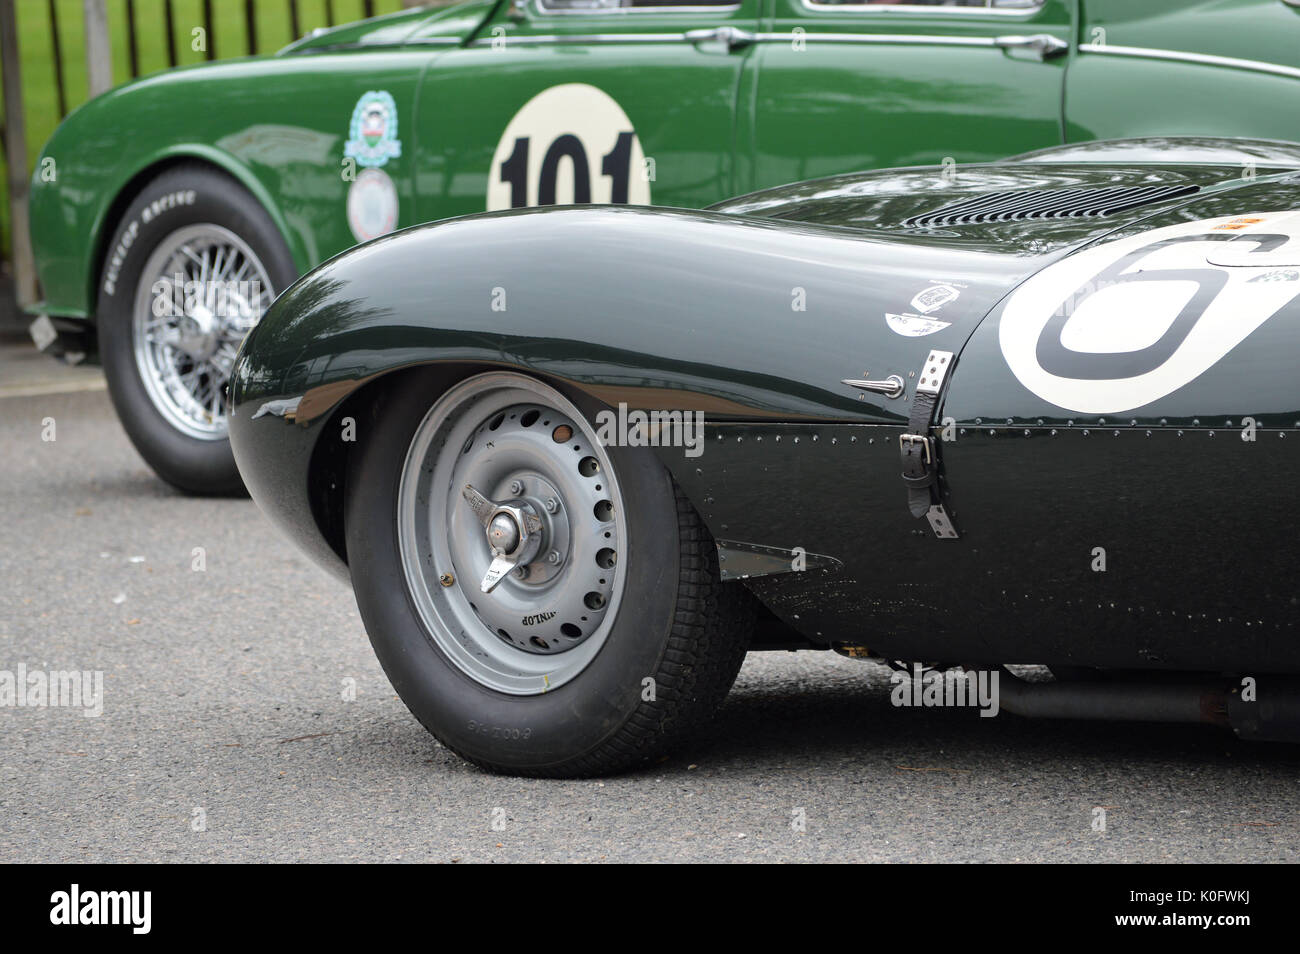 1955 mike hawthorn jaguar d type le mans winning car stock photo royalty free image 155242742. Black Bedroom Furniture Sets. Home Design Ideas